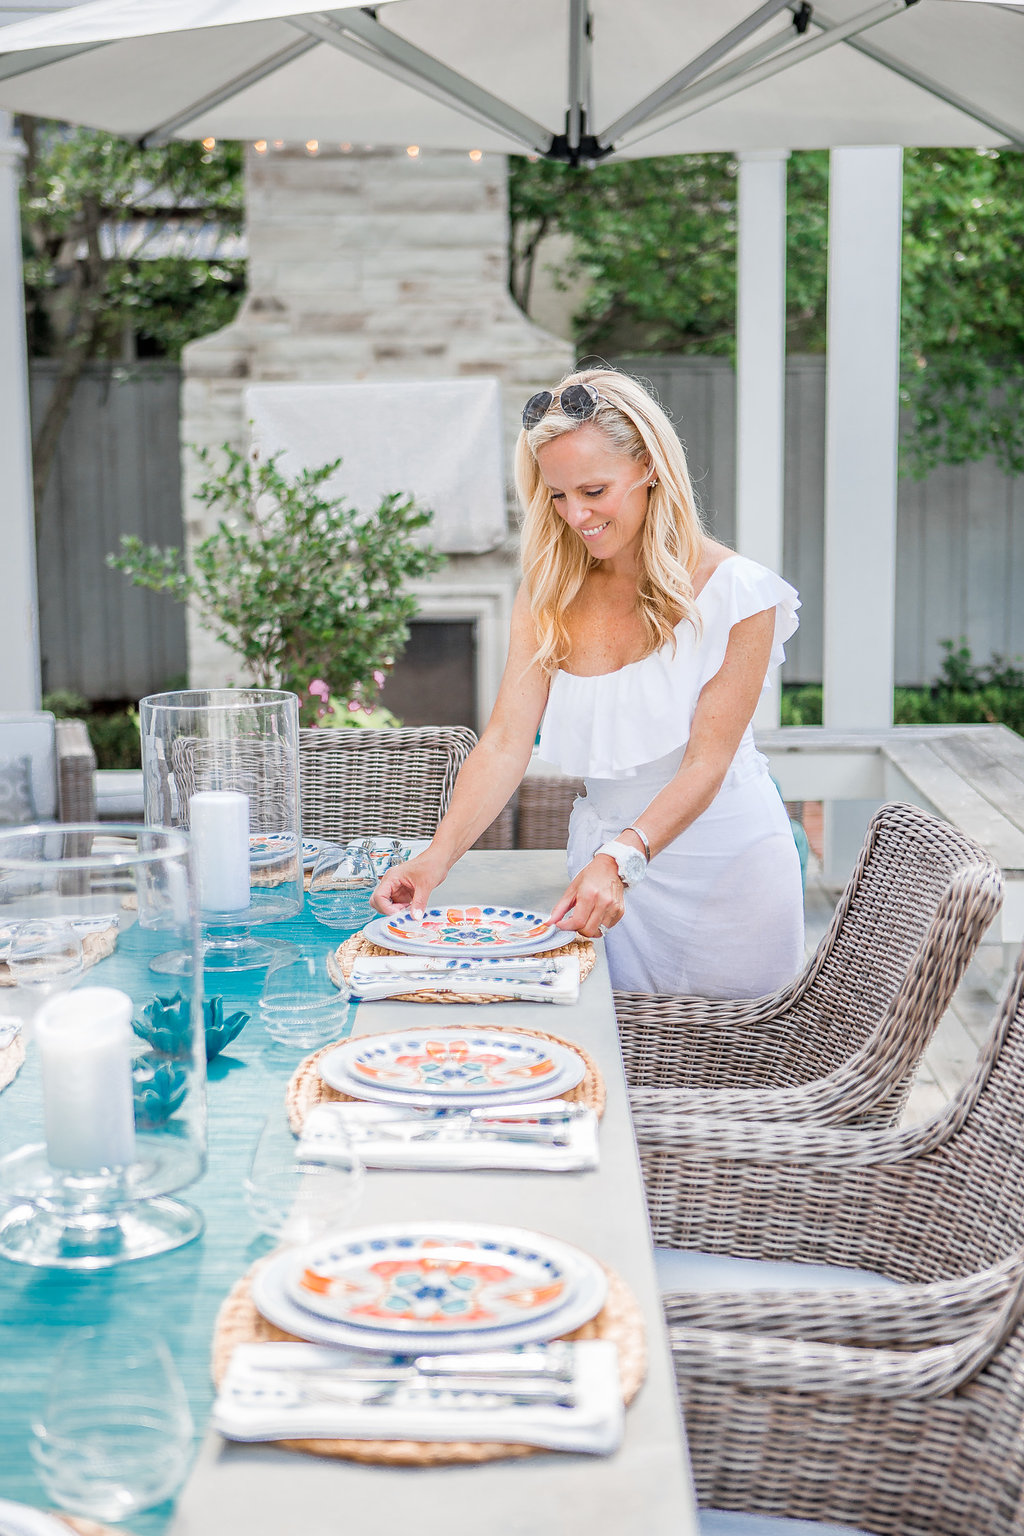 Alicia Wood, Dallas Lifestyle Expert, Dallas Lifestyle Blogger, Dallas Fashion Blogger, Juliska Melamine Dinnerware, Outdoor Entertaining